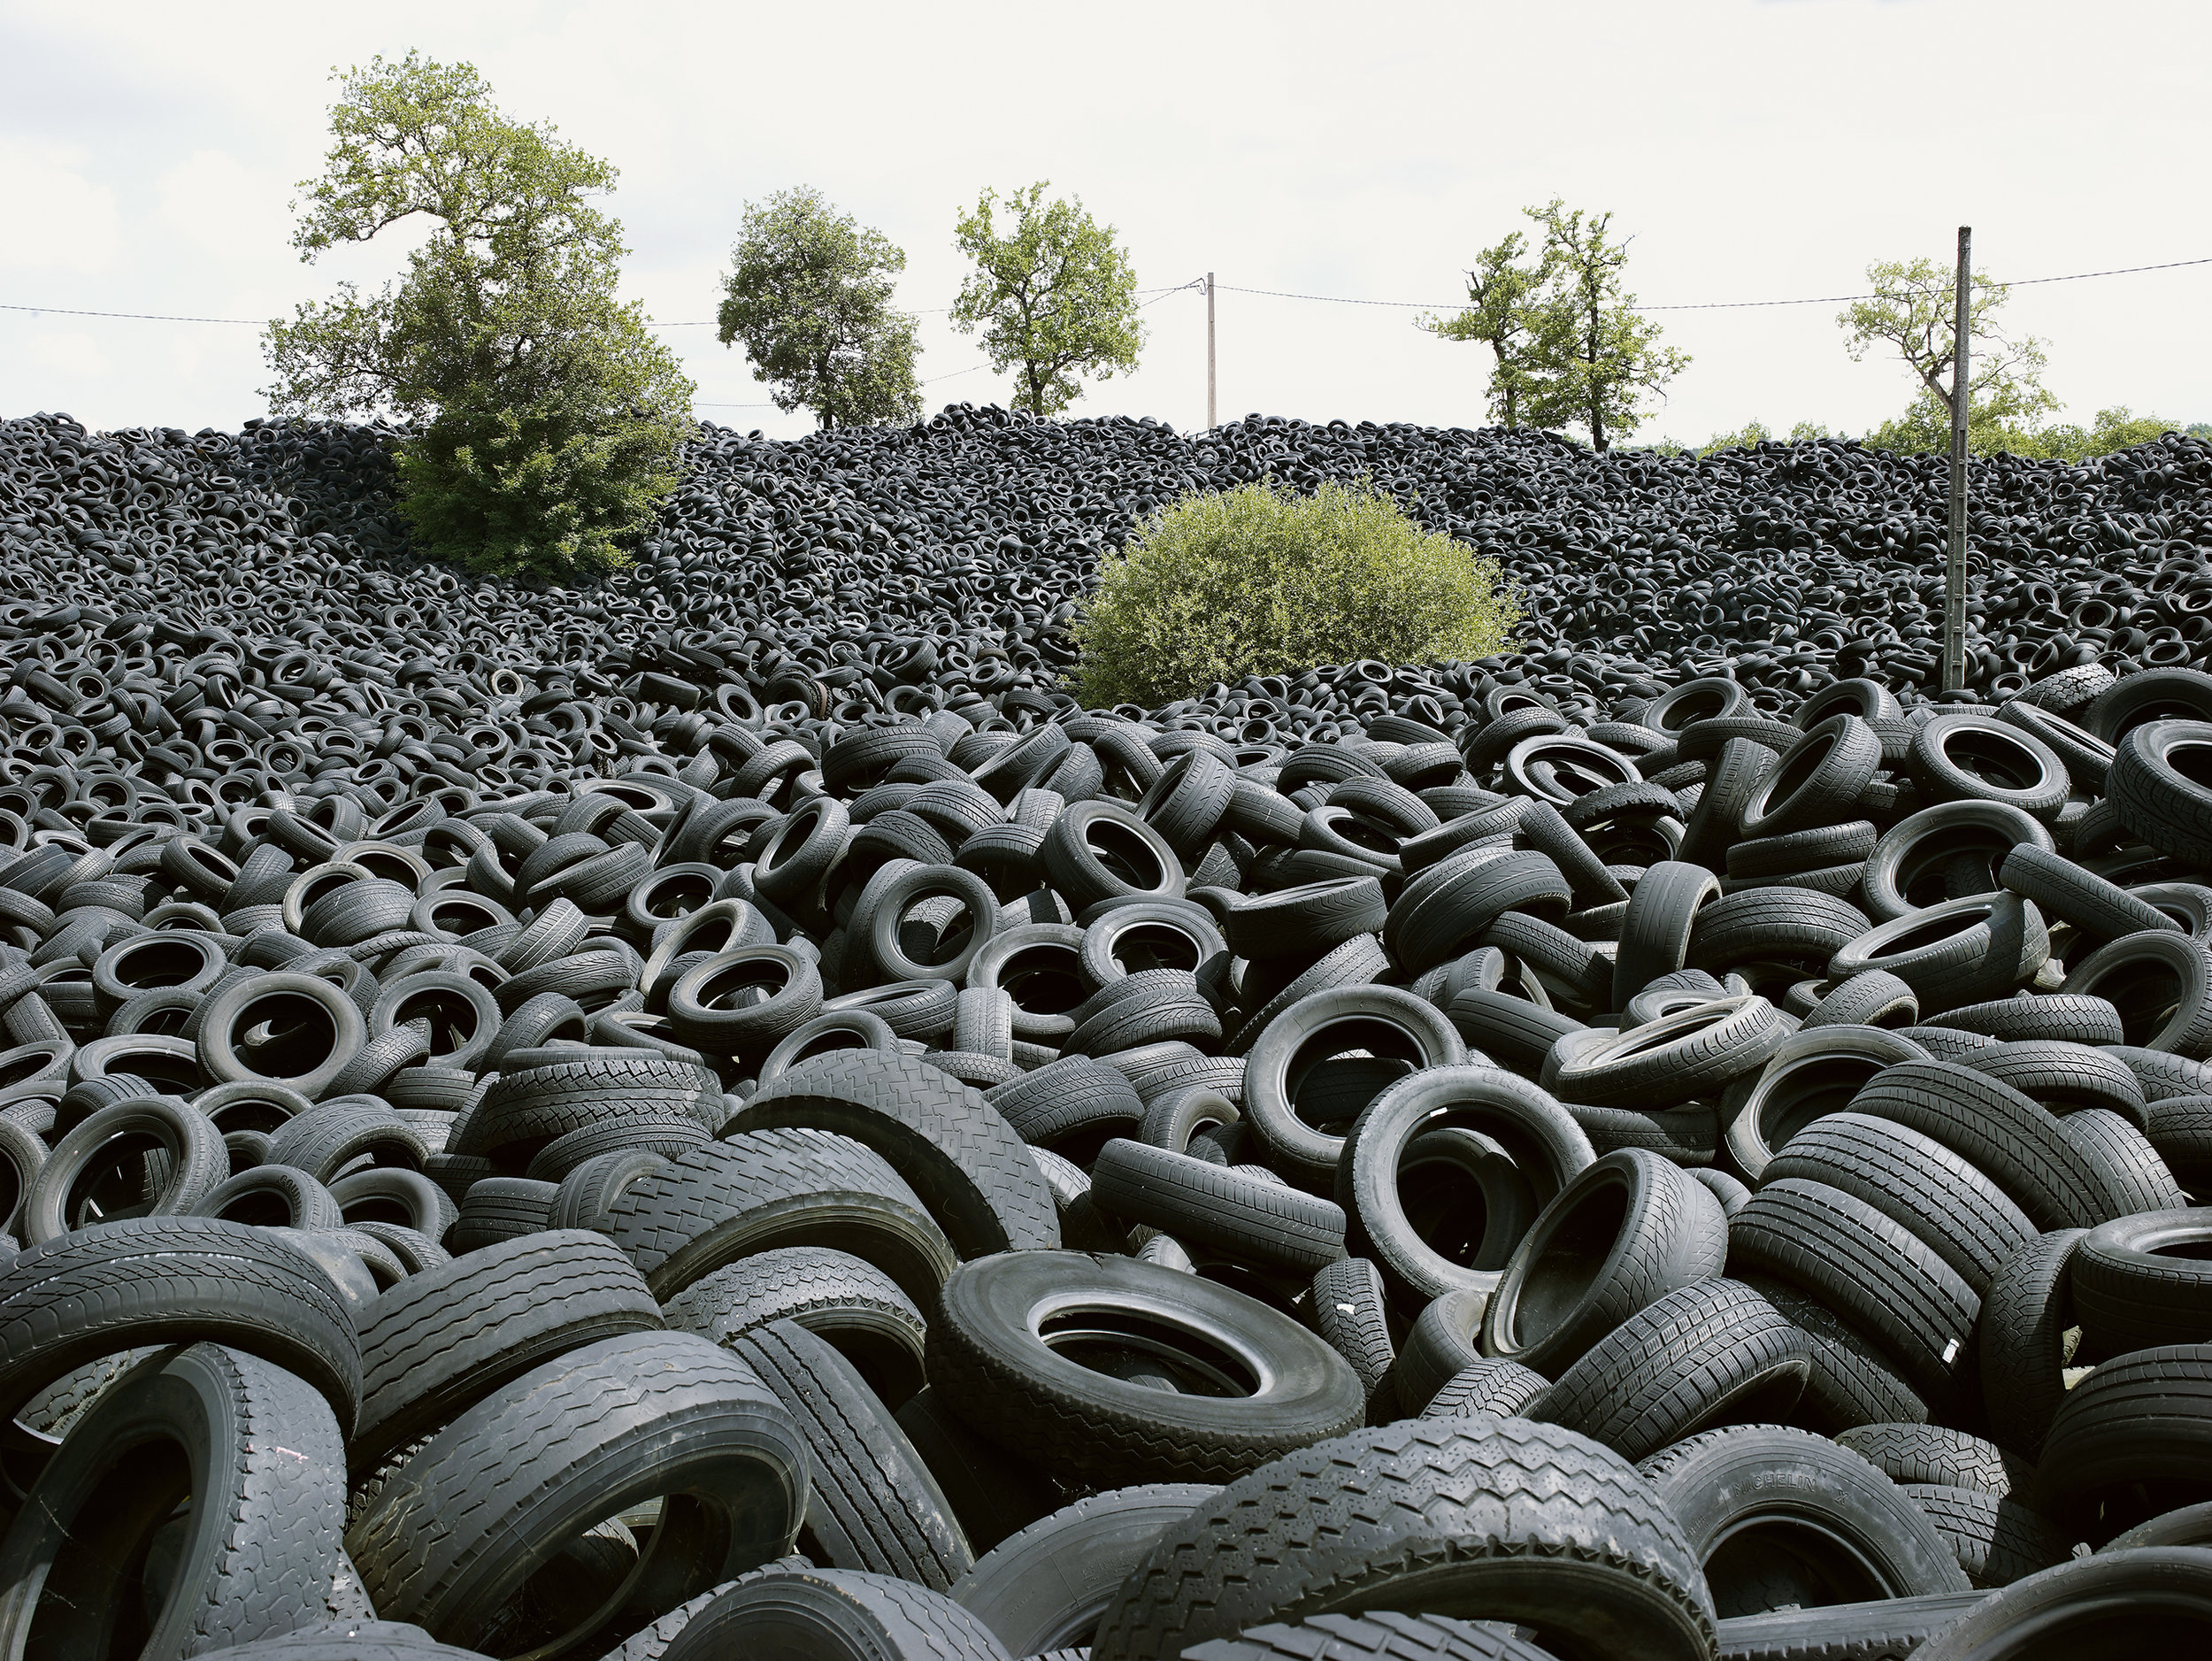 Tire dump 2, France, 2008.